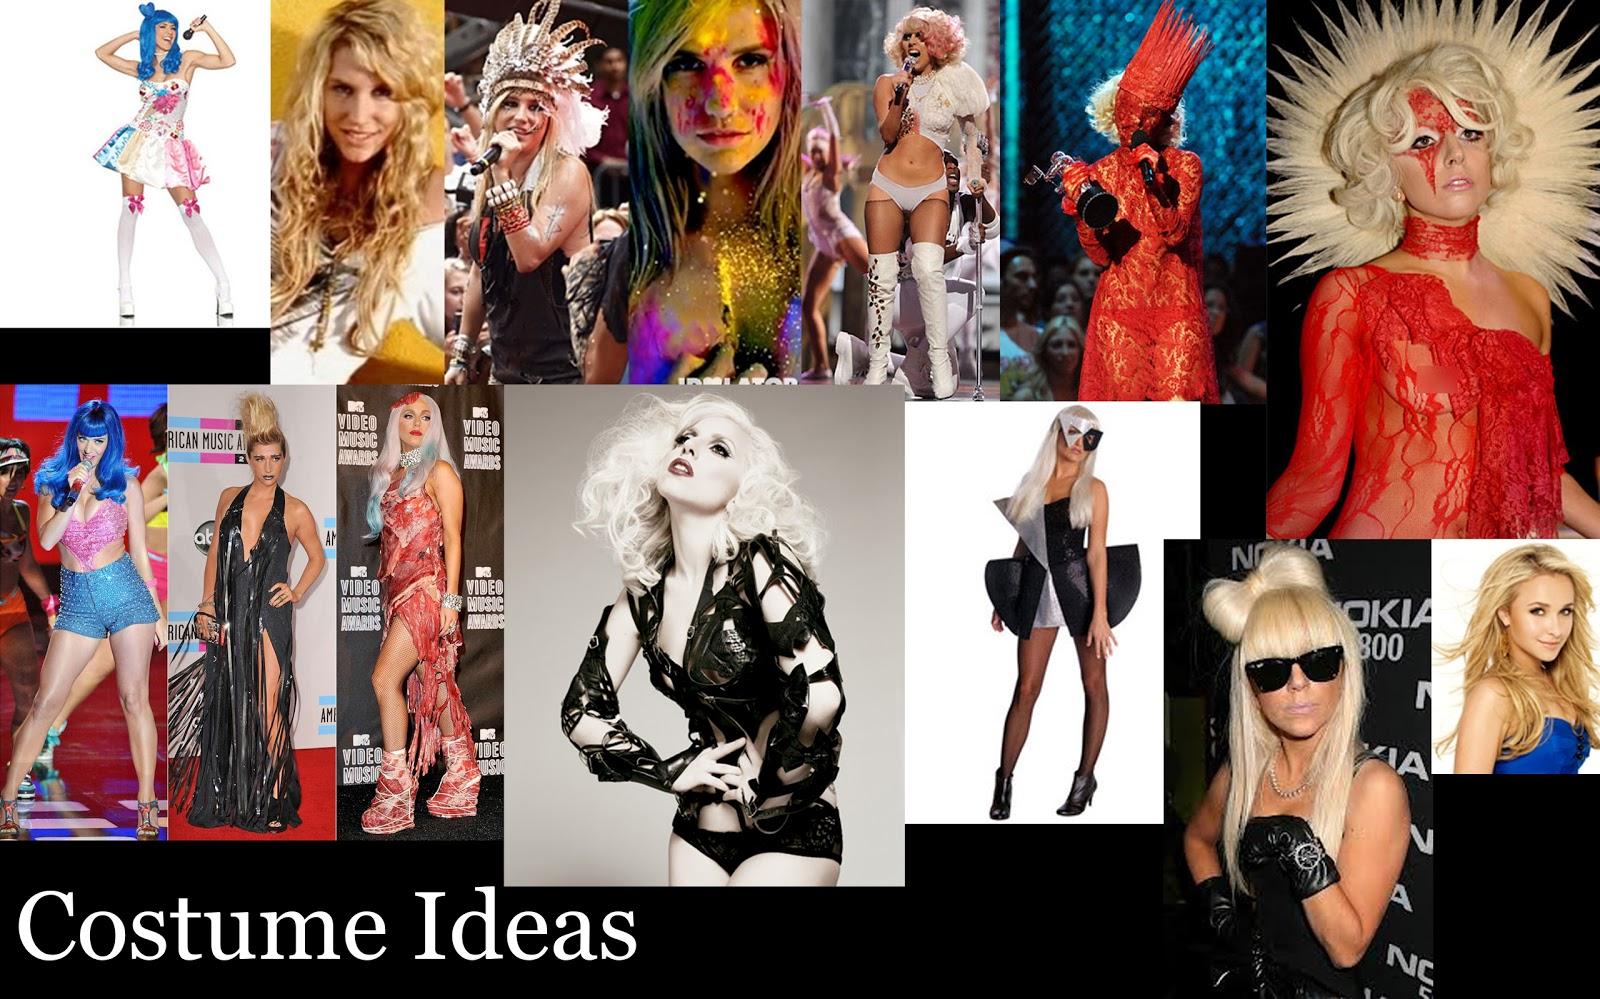 Costume Ideas for cover image  sc 1 st  Lauren Mabbett AS Media Coursework & Lauren Mabbett AS Media Coursework: Costume Ideas for cover image